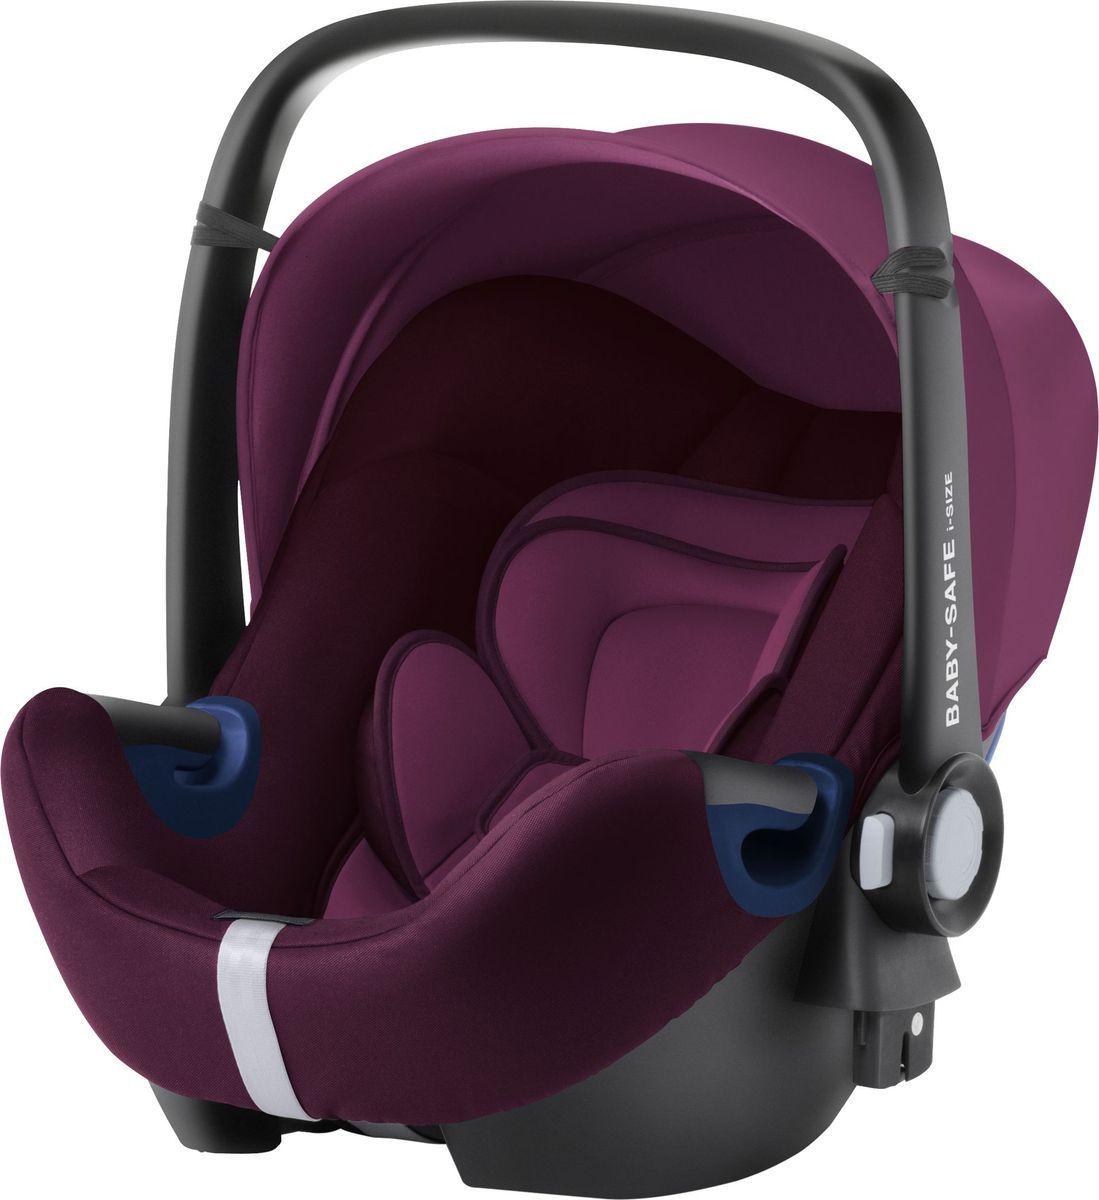 Детское автокресло Britax Romer Baby-Safe2 i-Size, Burgundy Red Trendline